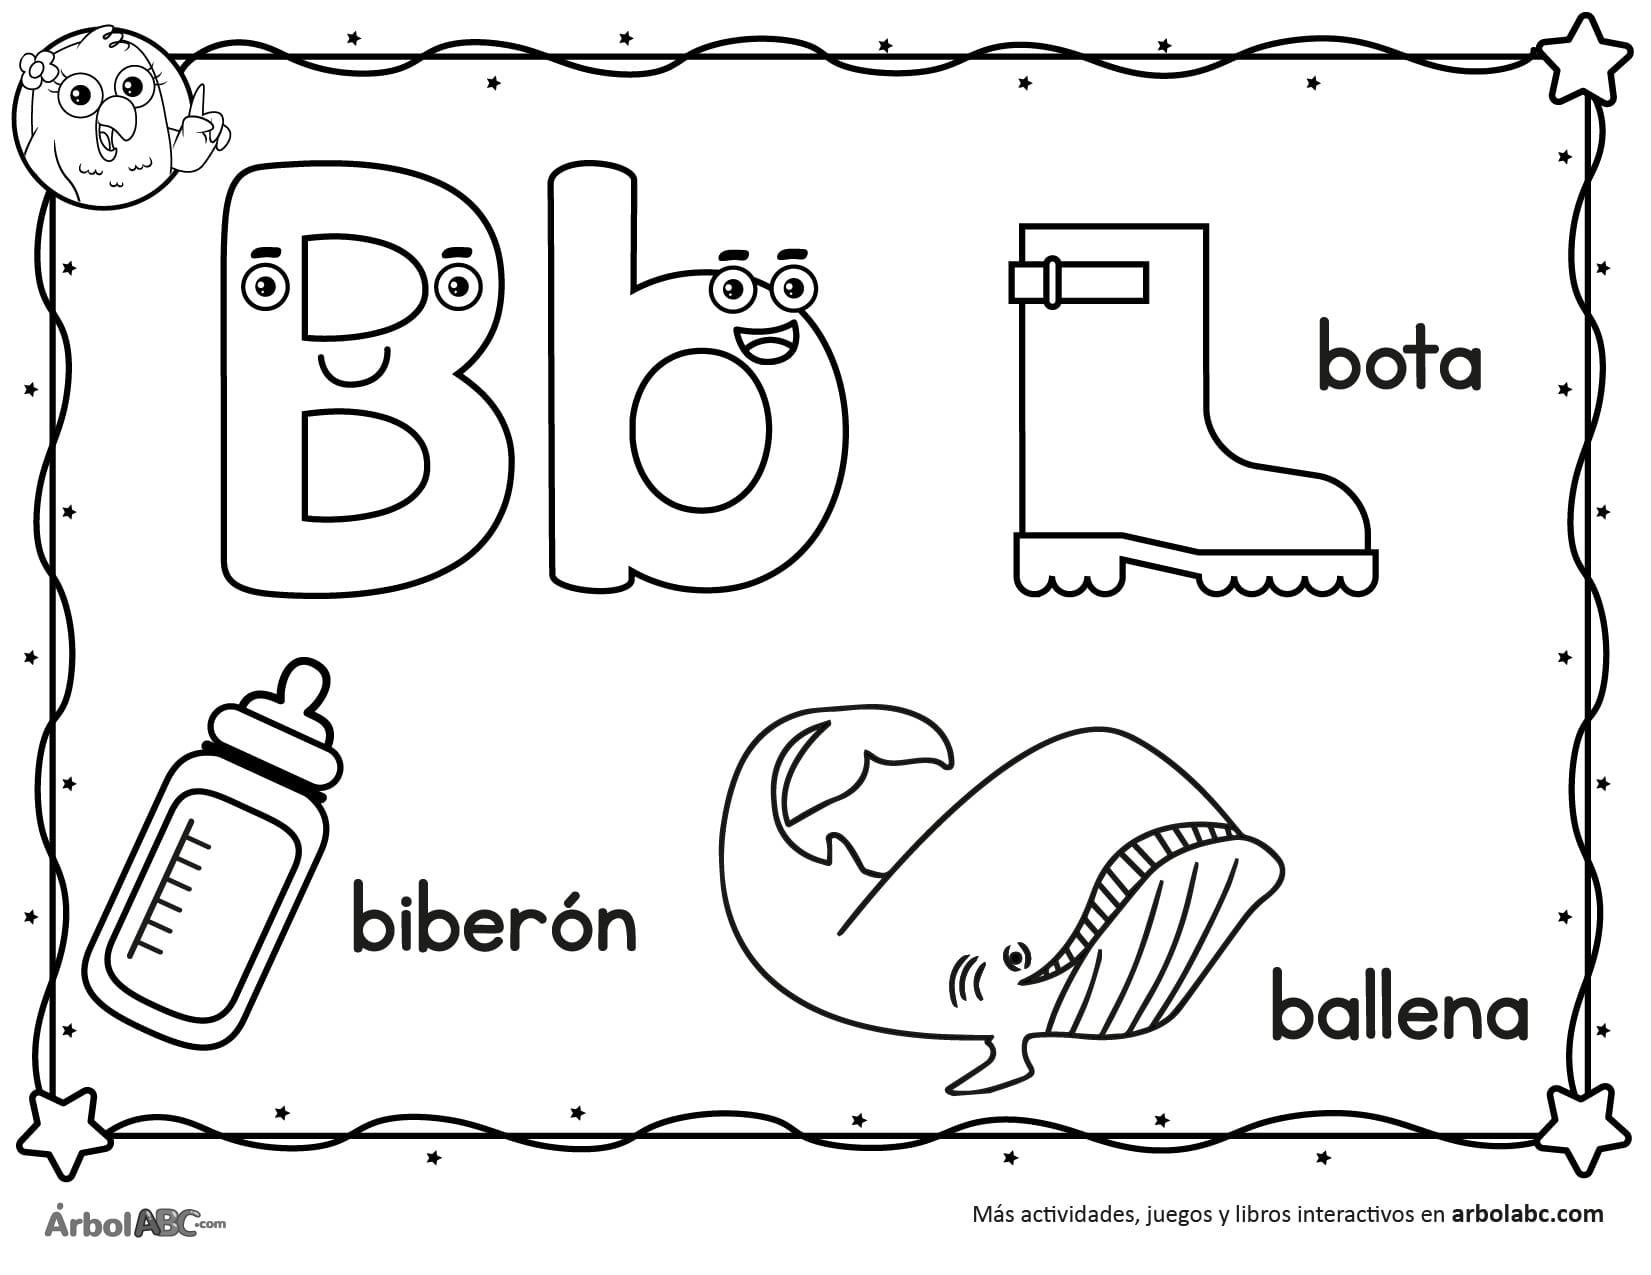 Letra B para colorear | Árbol ABC